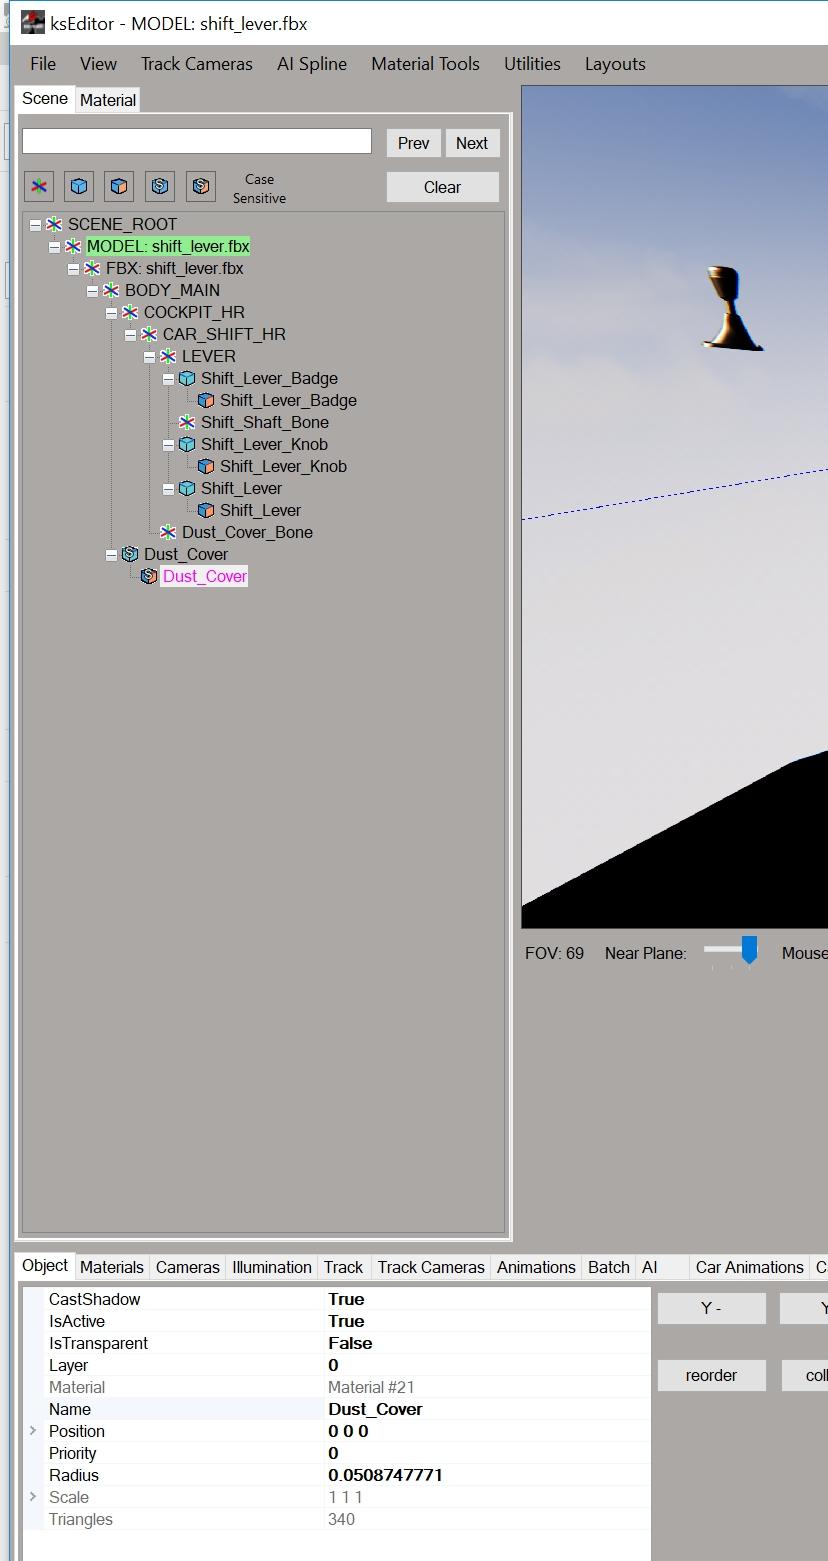 ks-edit-per-pixel.jpg